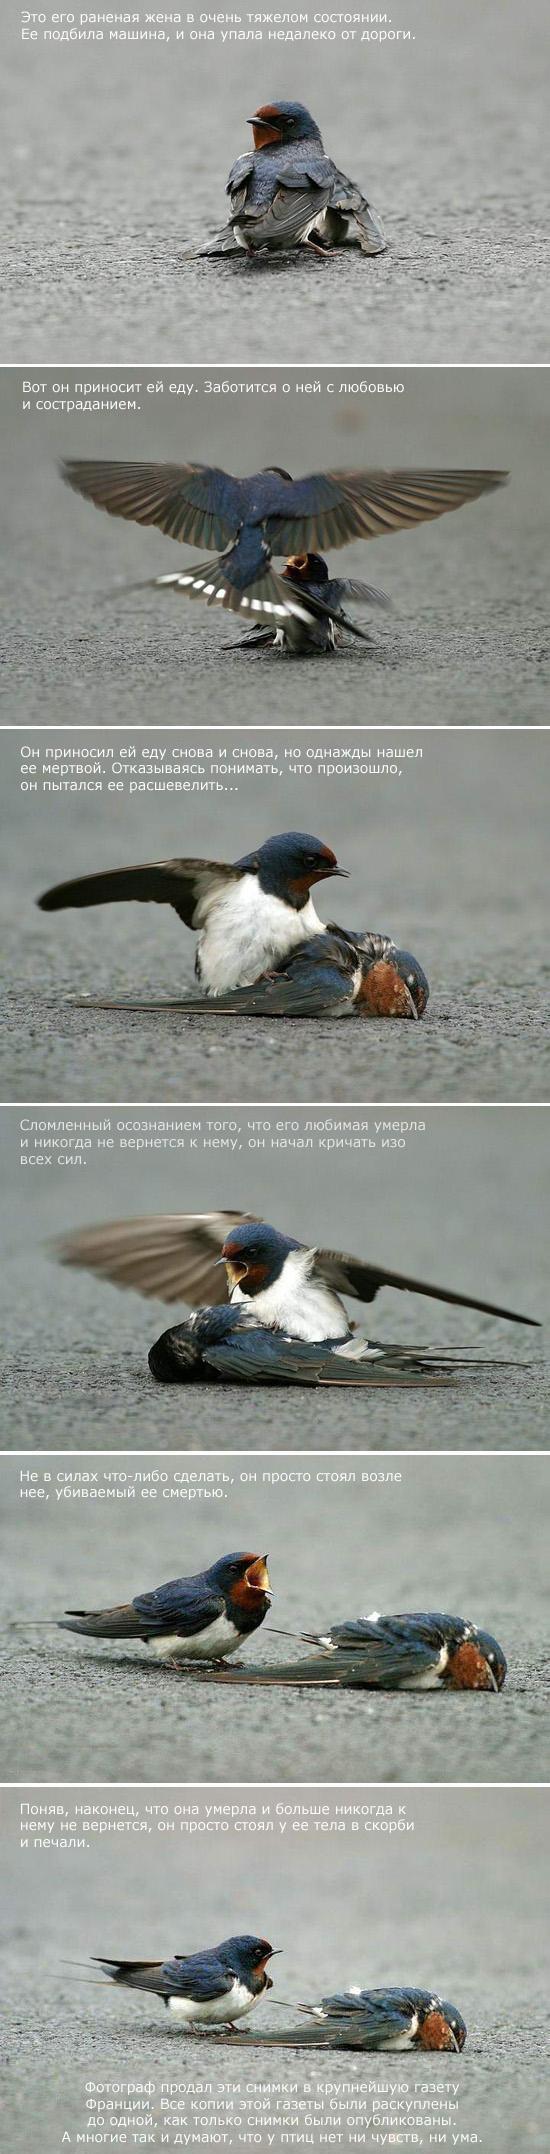 sad-story-about-bird-02